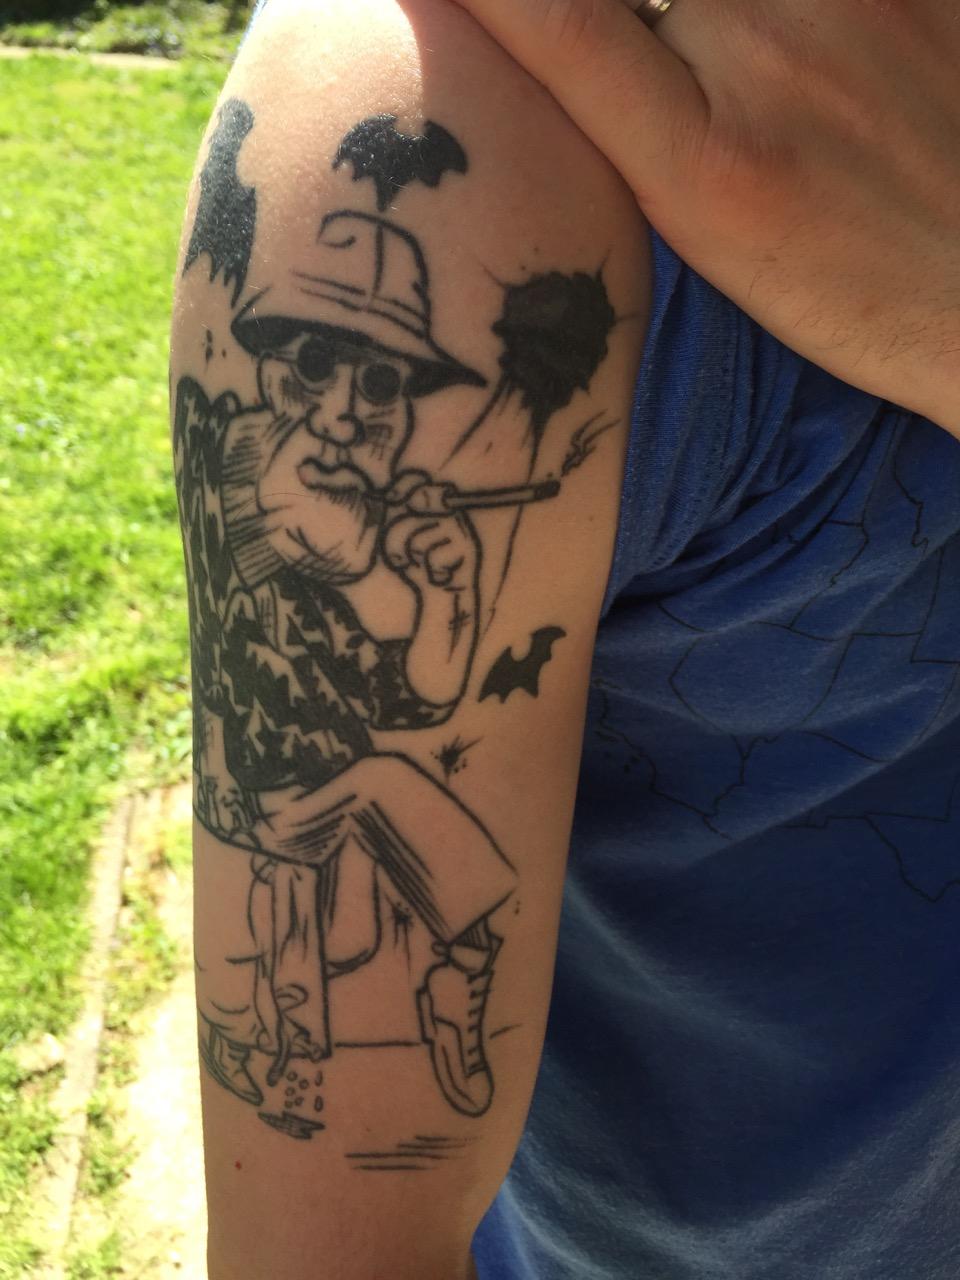 Local Irish rogue, and friend, Cillian Browne's HST tattoo.